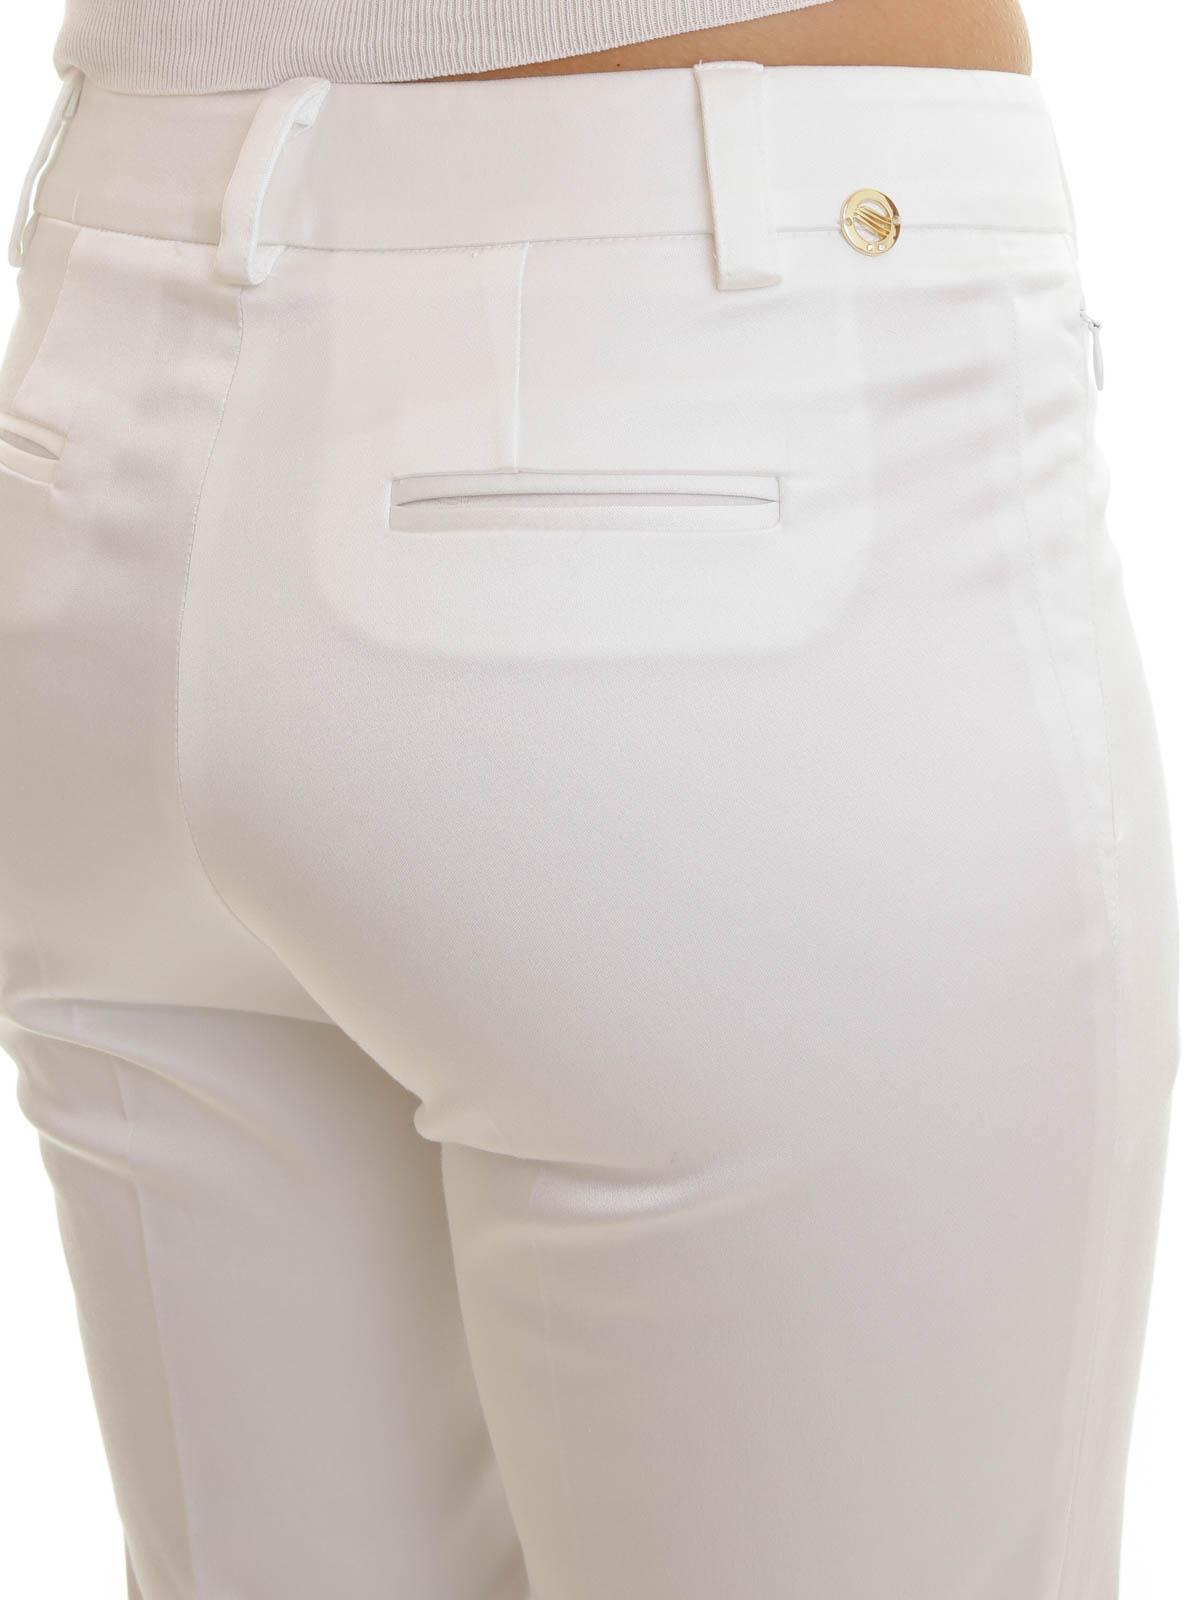 Angelo Marani buy online Pantalón De Traje Blanco Para Mujer. Angelo Marani   Pantalones casual ... 2ab6e8253faf